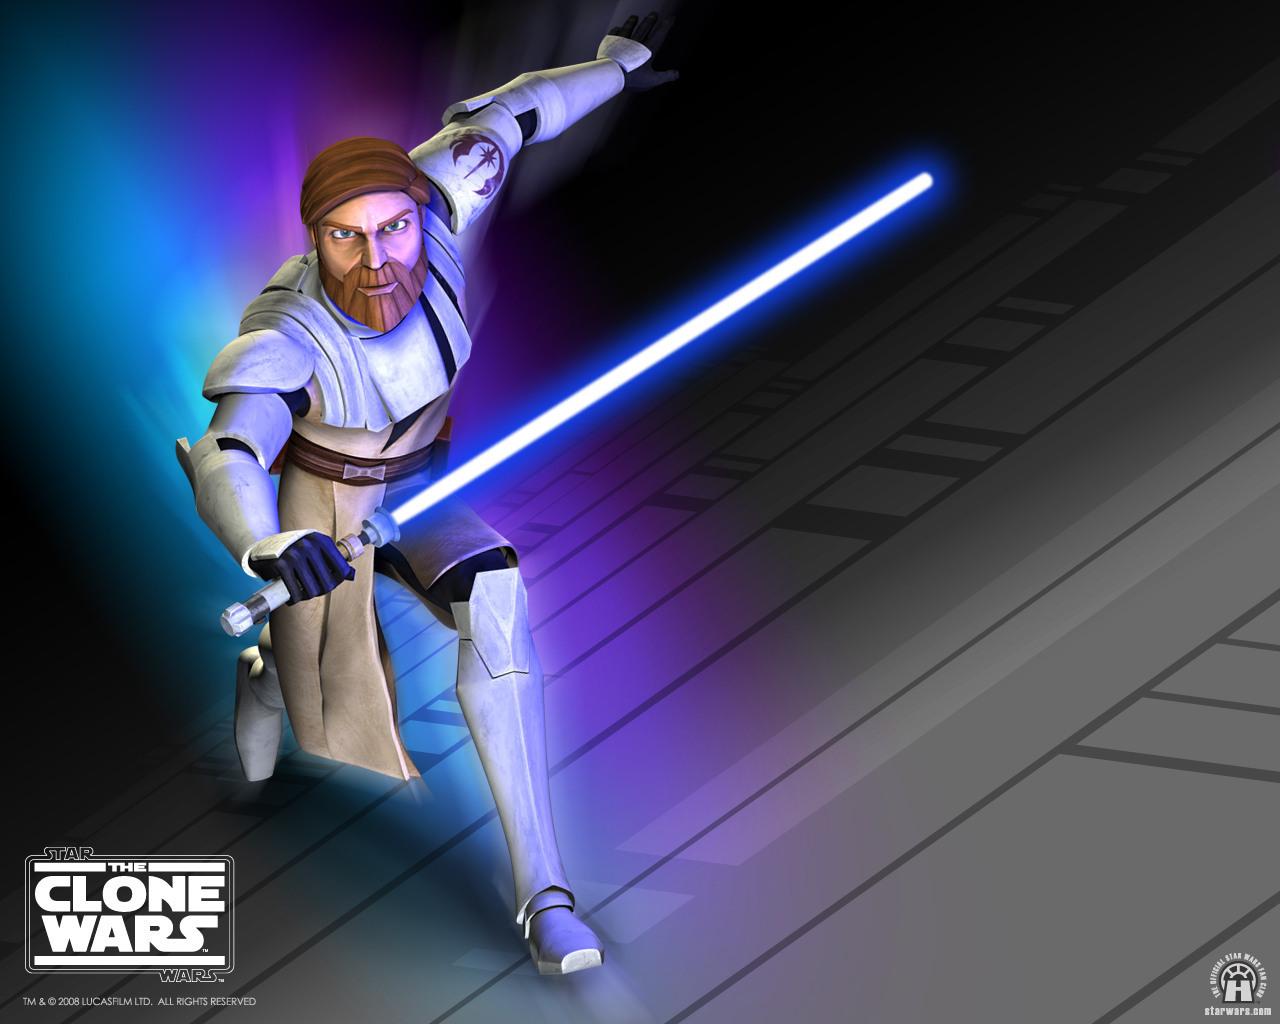 Clone Wars Obi Wan Kenobi Wallpaper 2951795 Fanpop